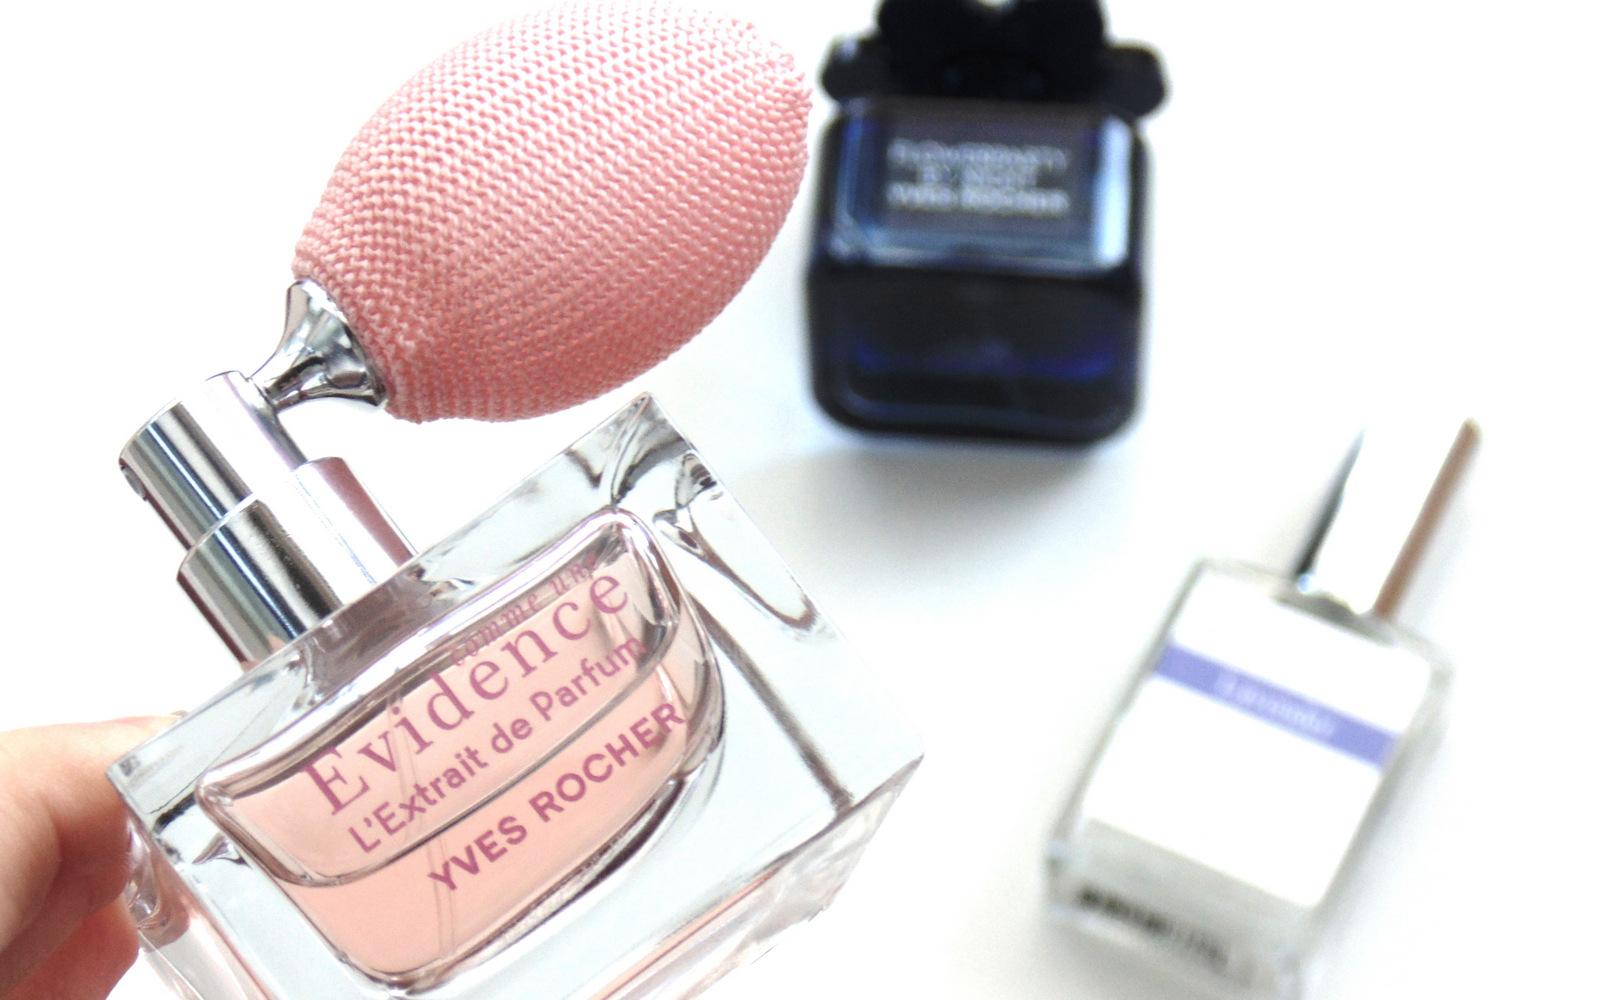 My Current Favourite Fragrances